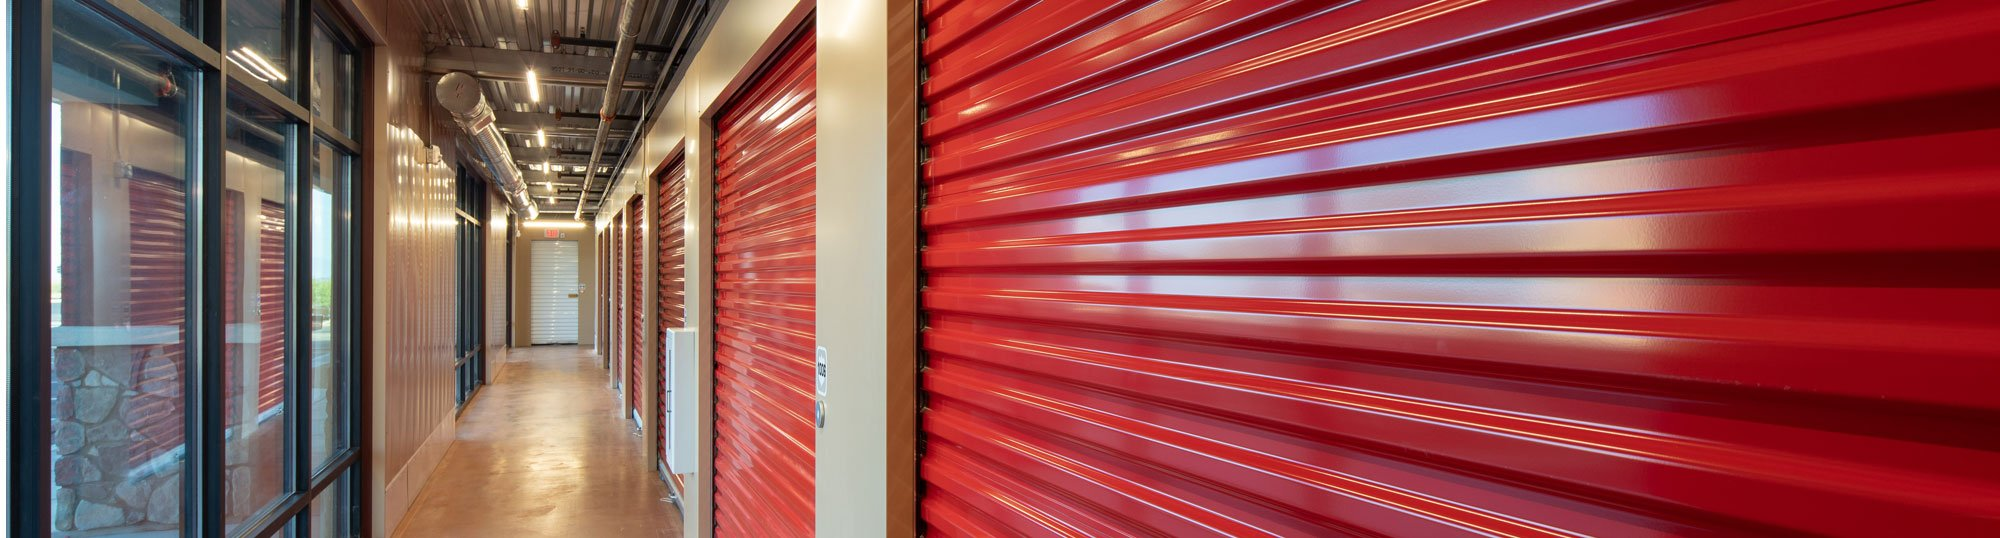 Self storage doors